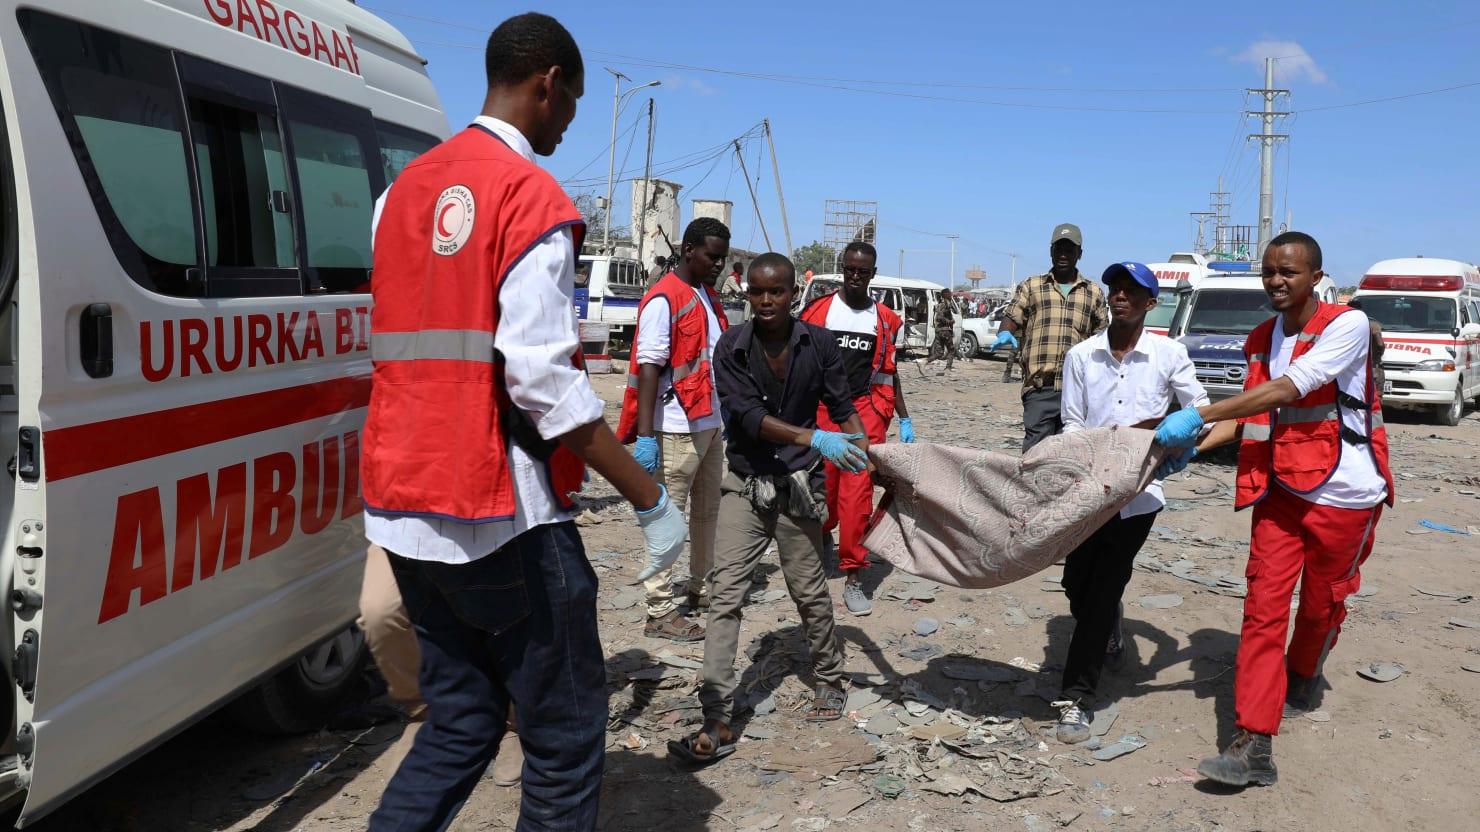 At least 73 Dead in Truck Bombing at Busy Market in Mogadishu, Somalia